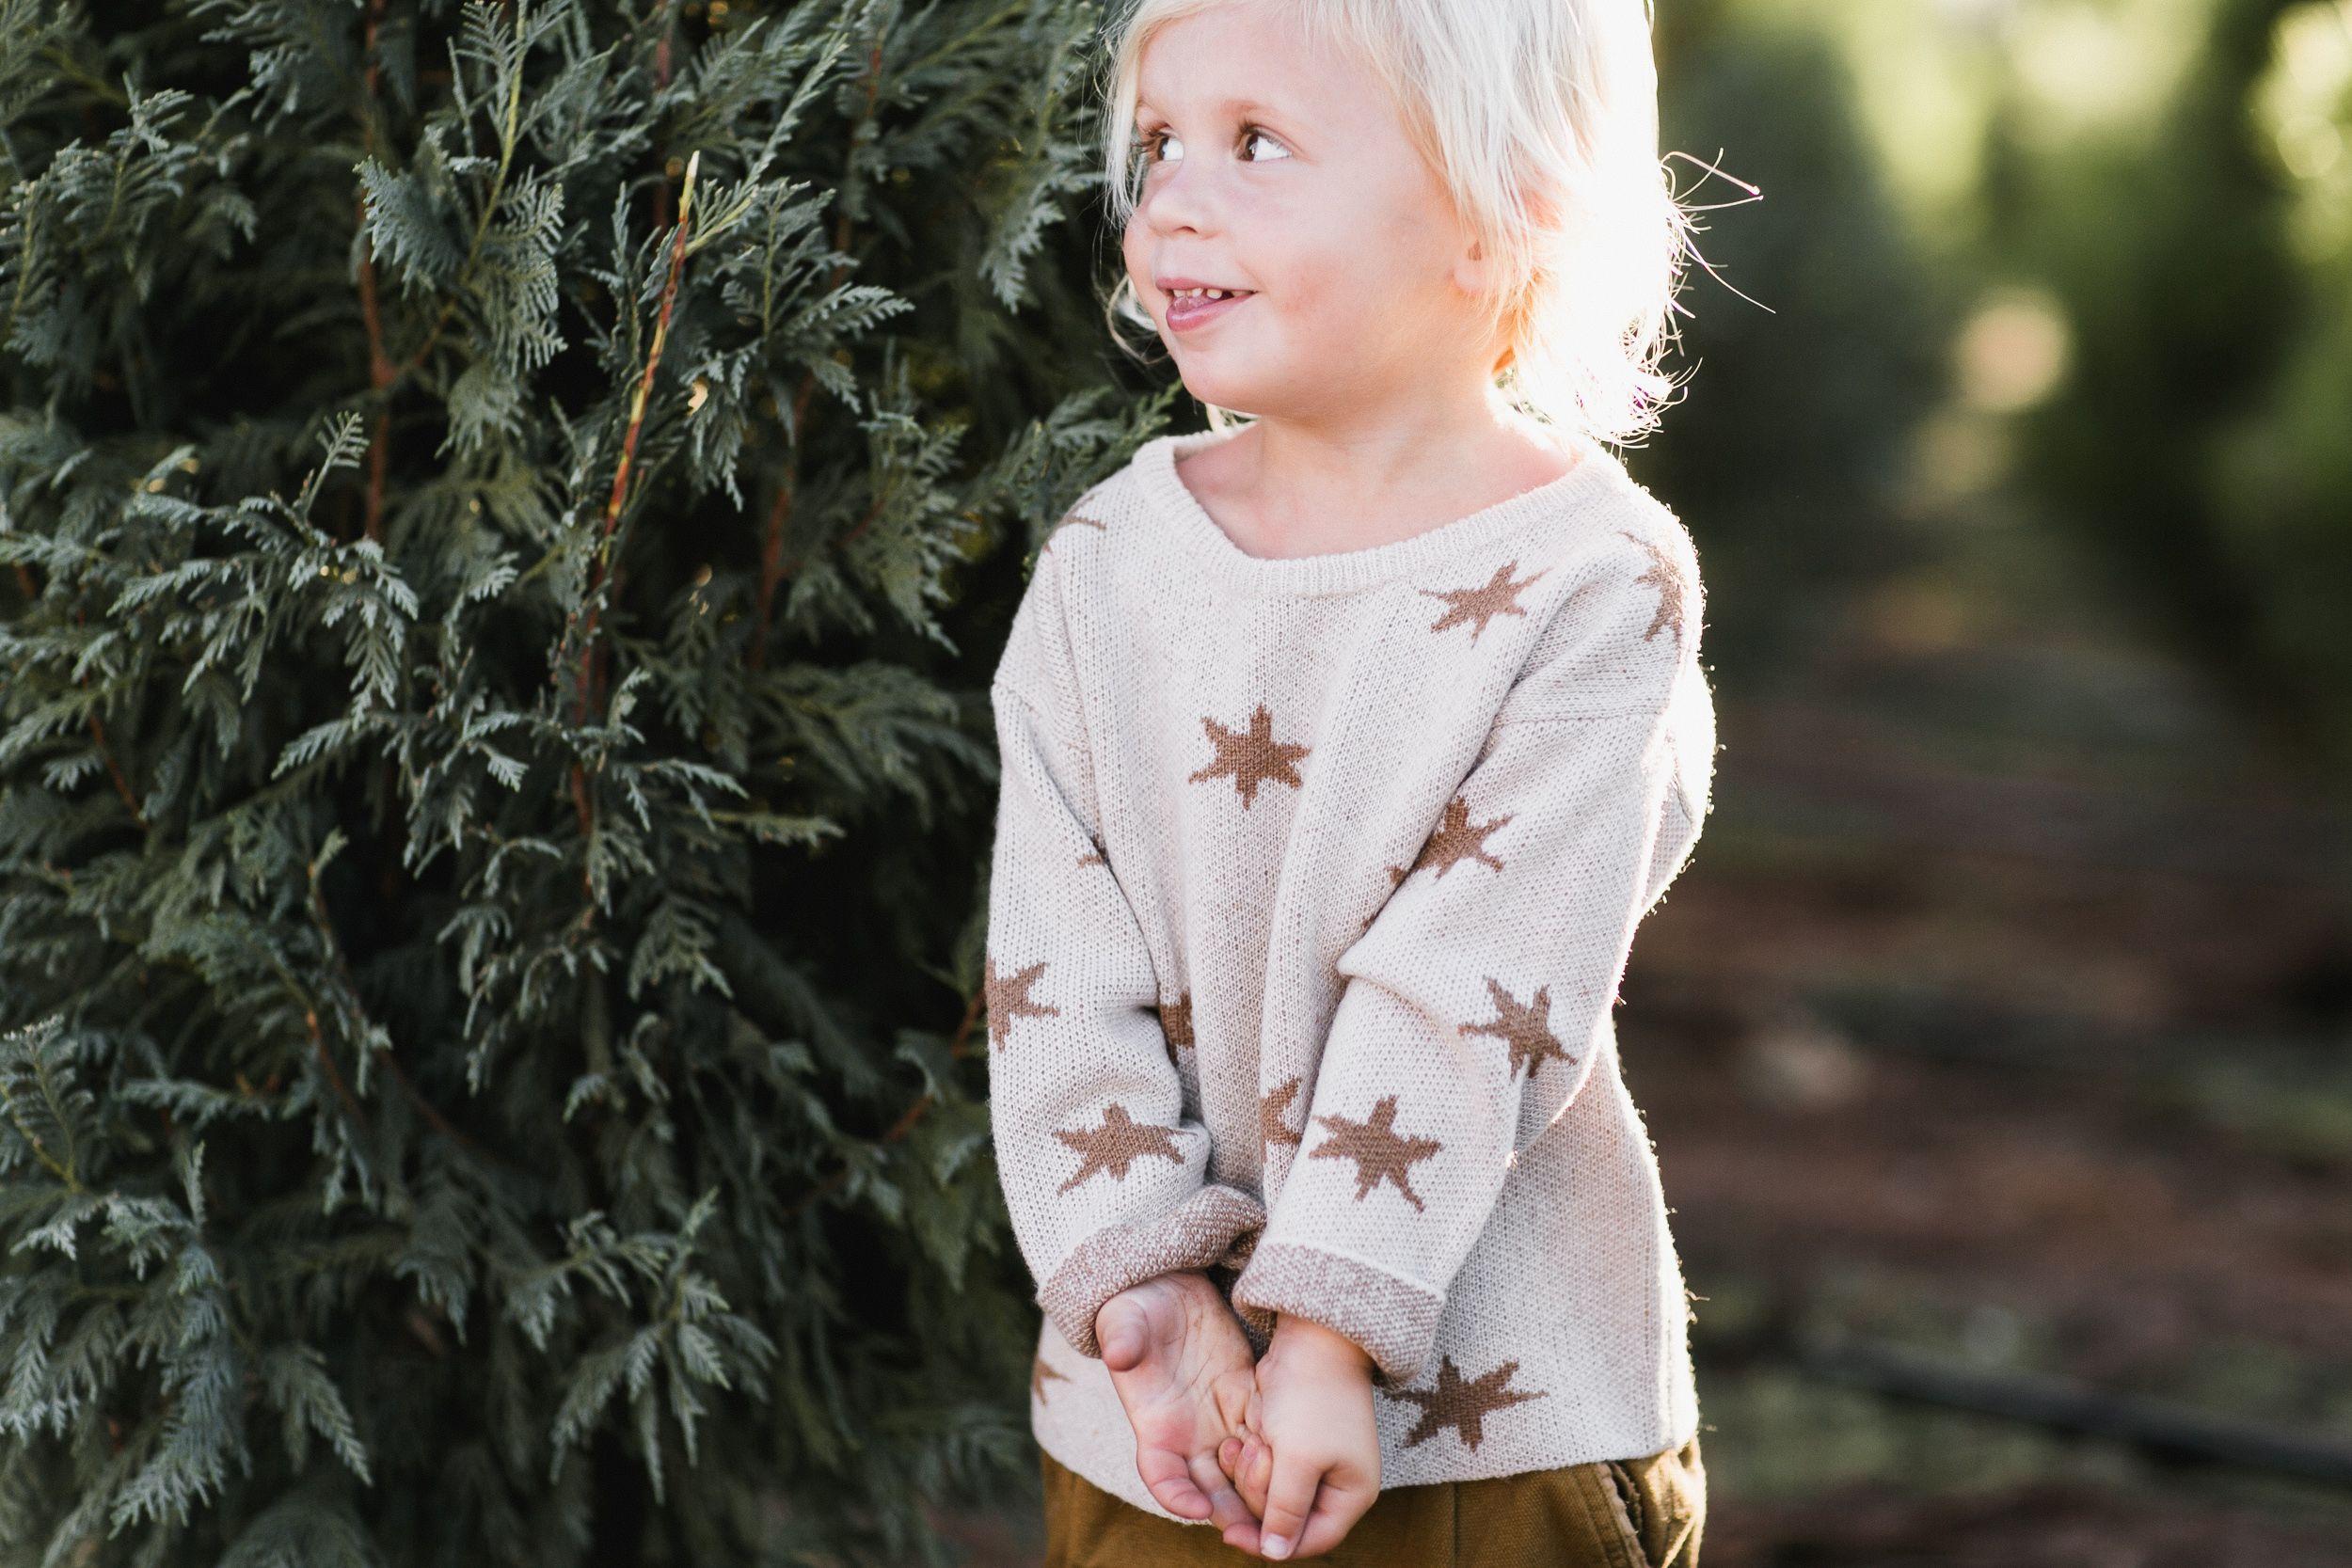 Rylee + Cru Boy Sweater   Starlight North Sweater   North ...